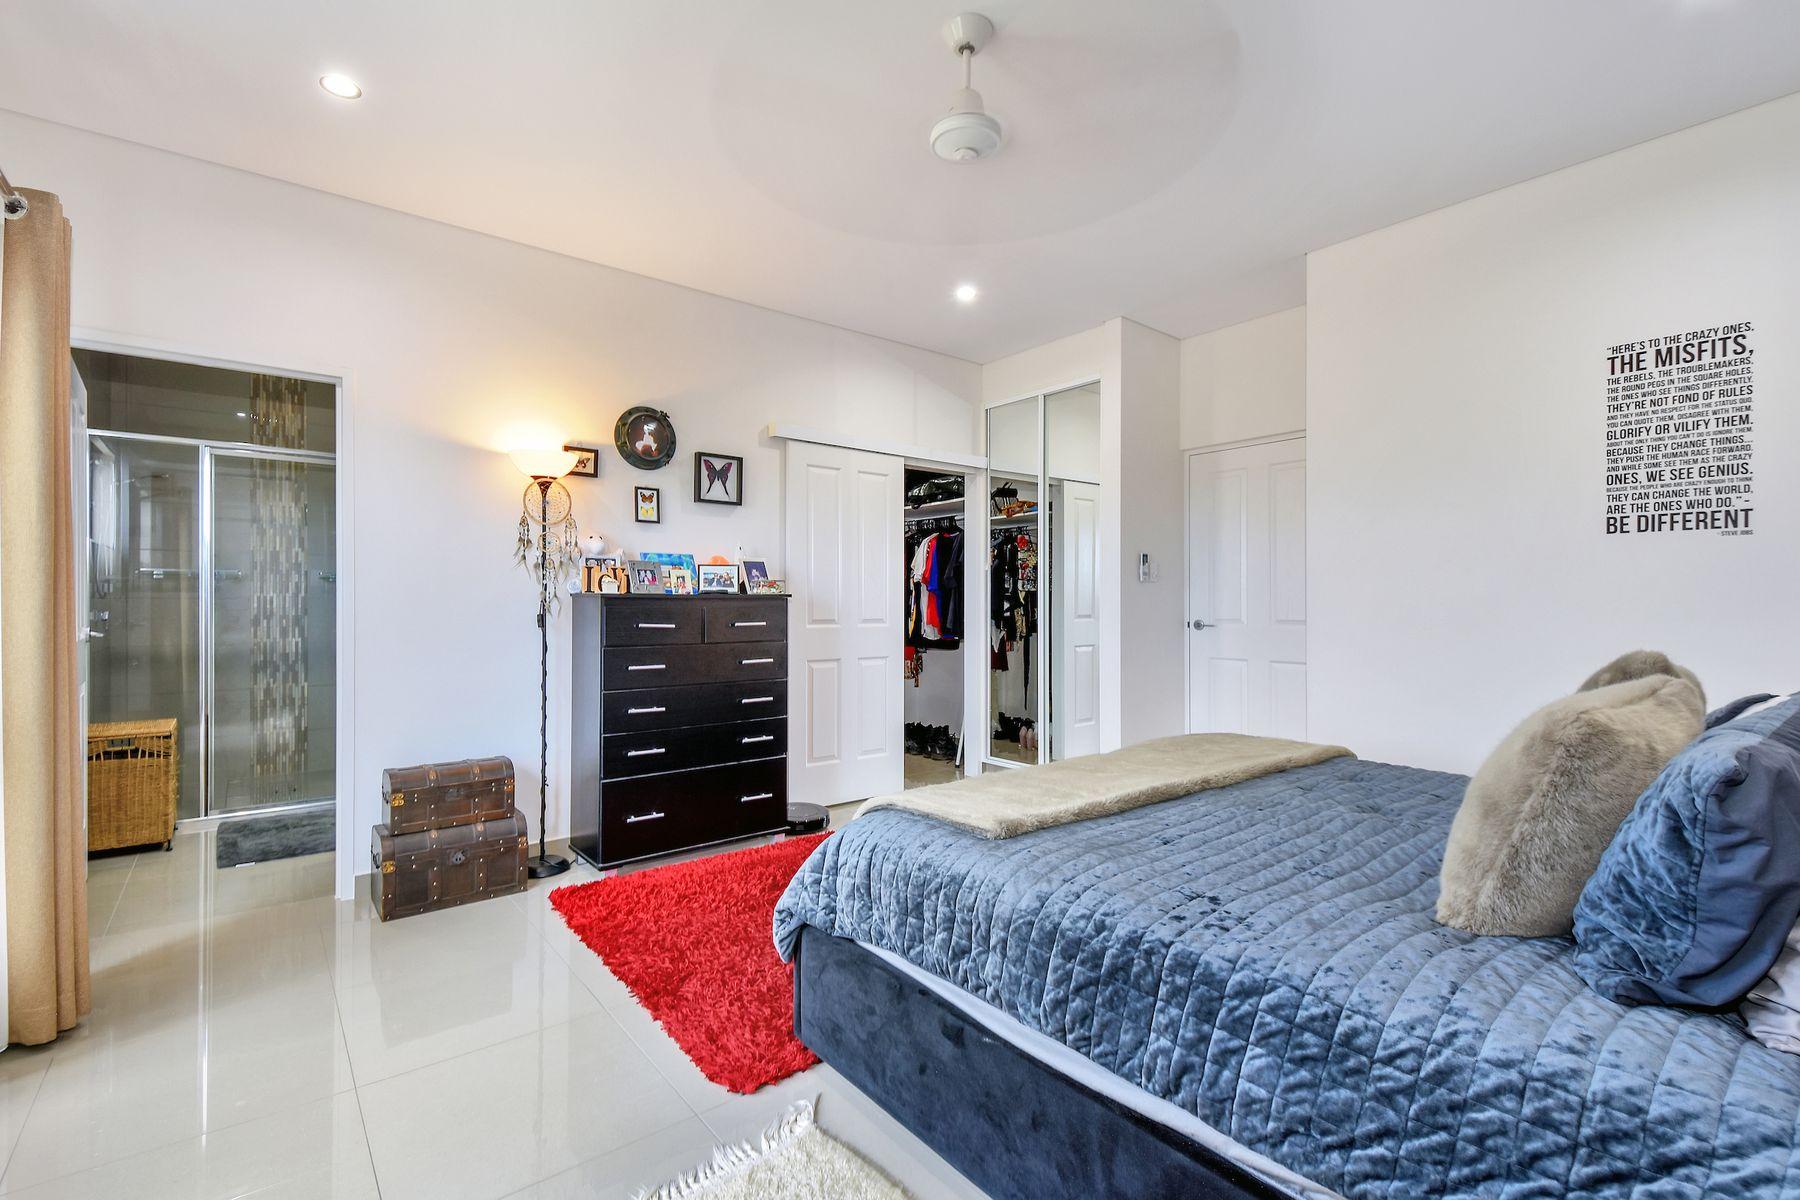 101 Hargrave Street, Muirhead, NT 0810